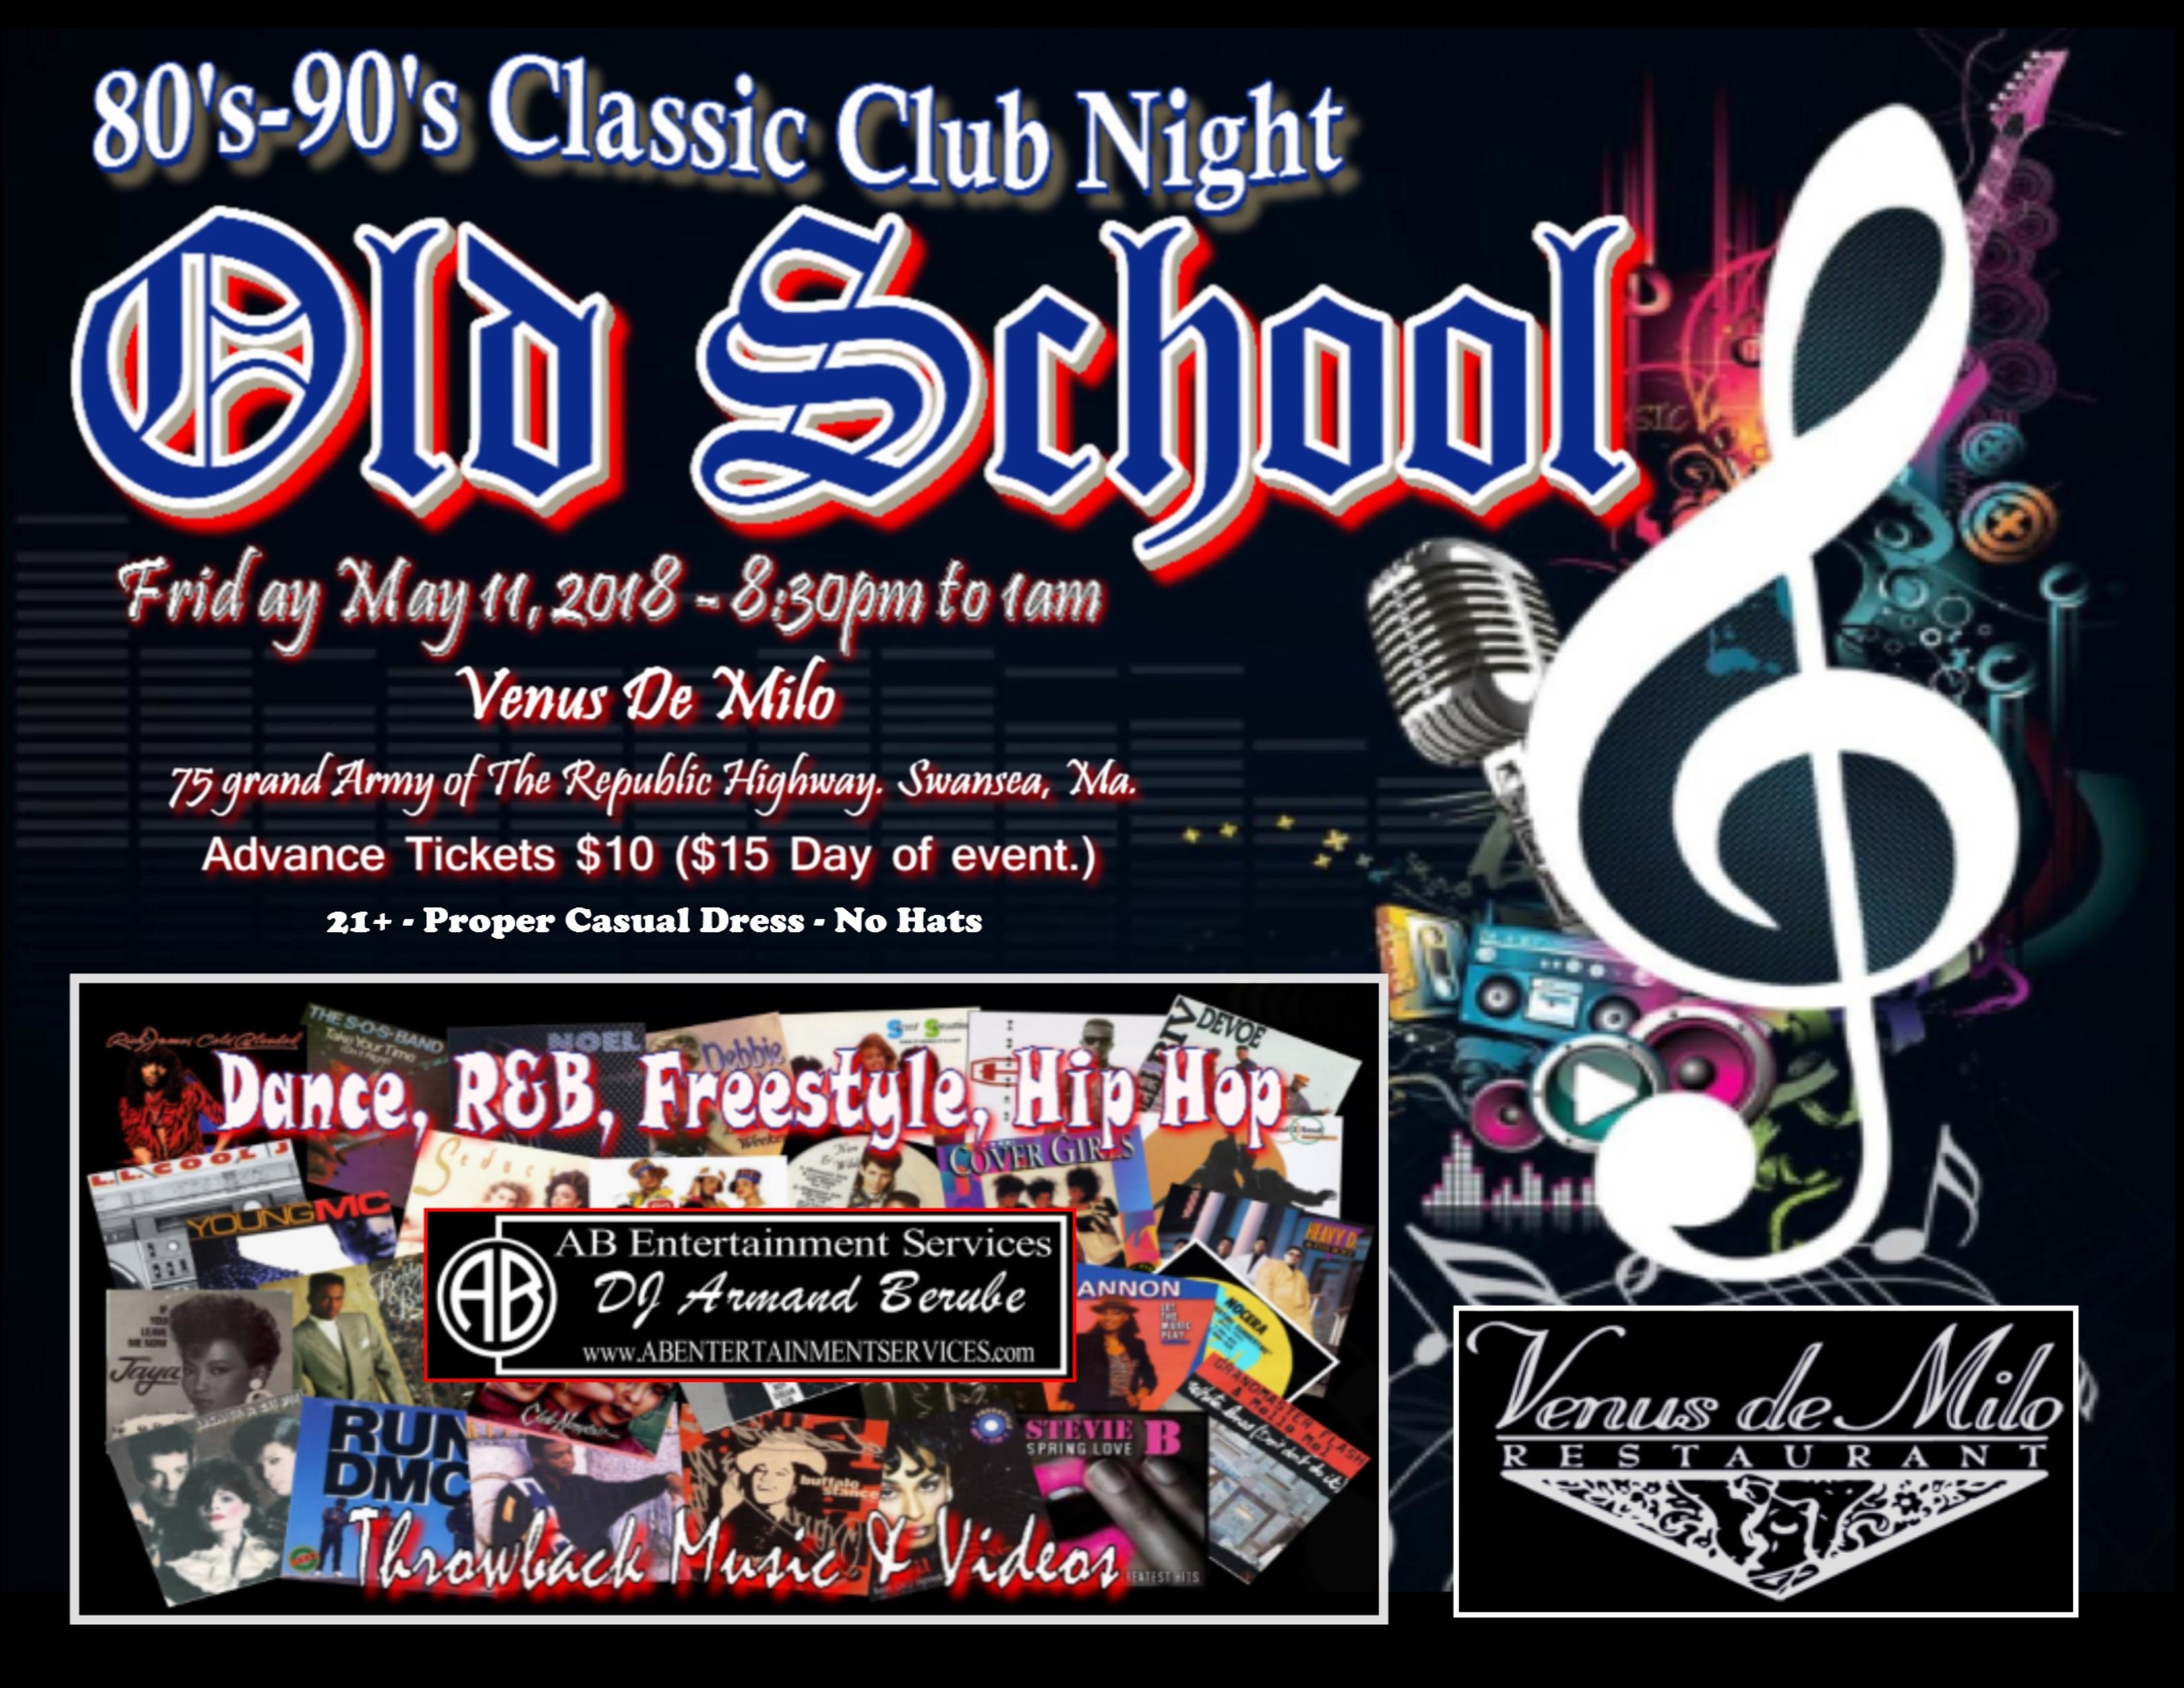 Old School 80\'s – 90\'s Classic Club Night ~ Guest Ticket | Venus de Milo